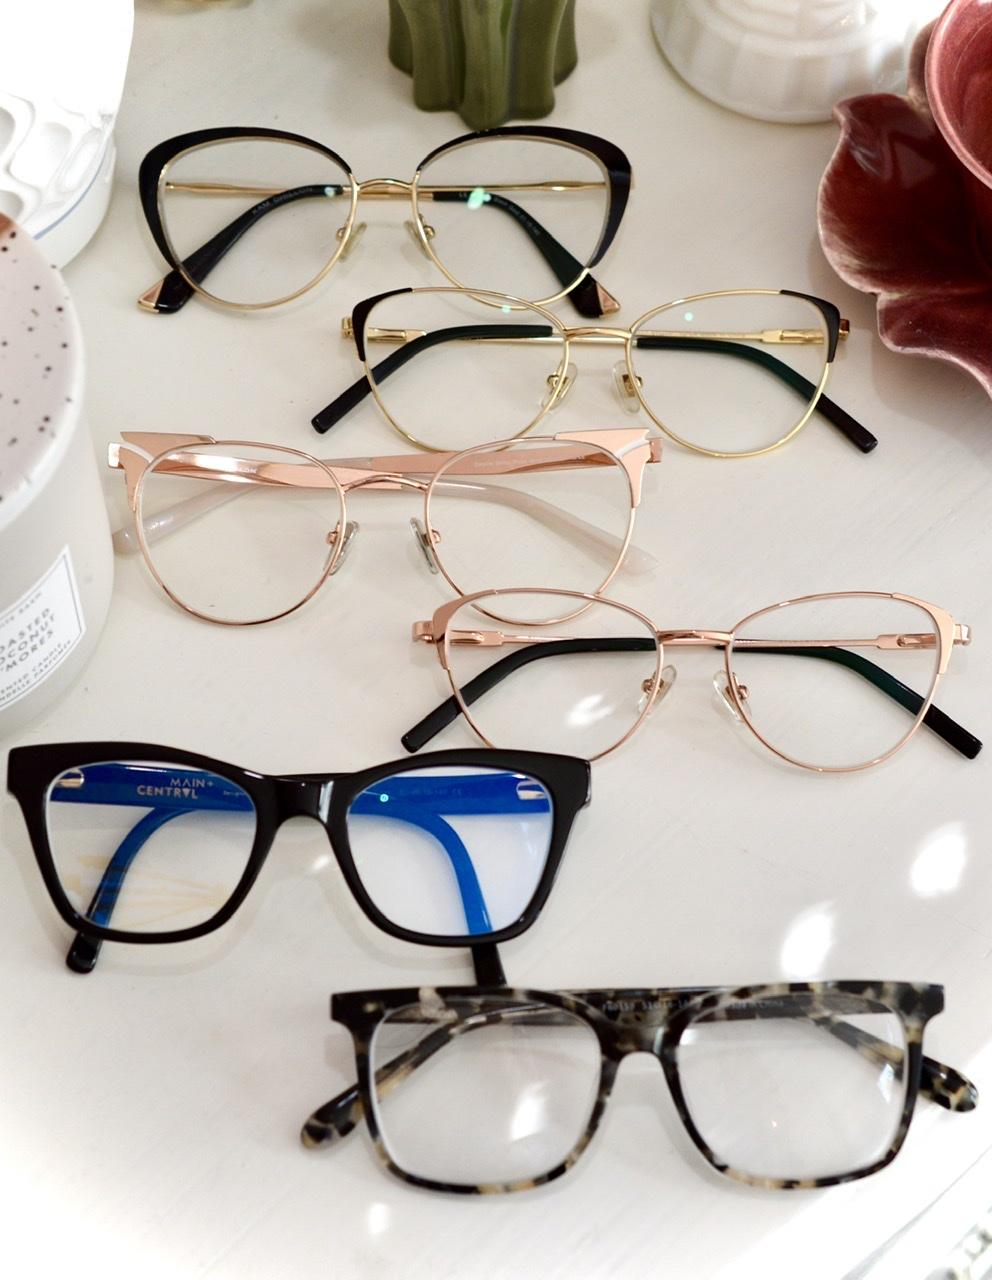 Firmoo cat eye glasses